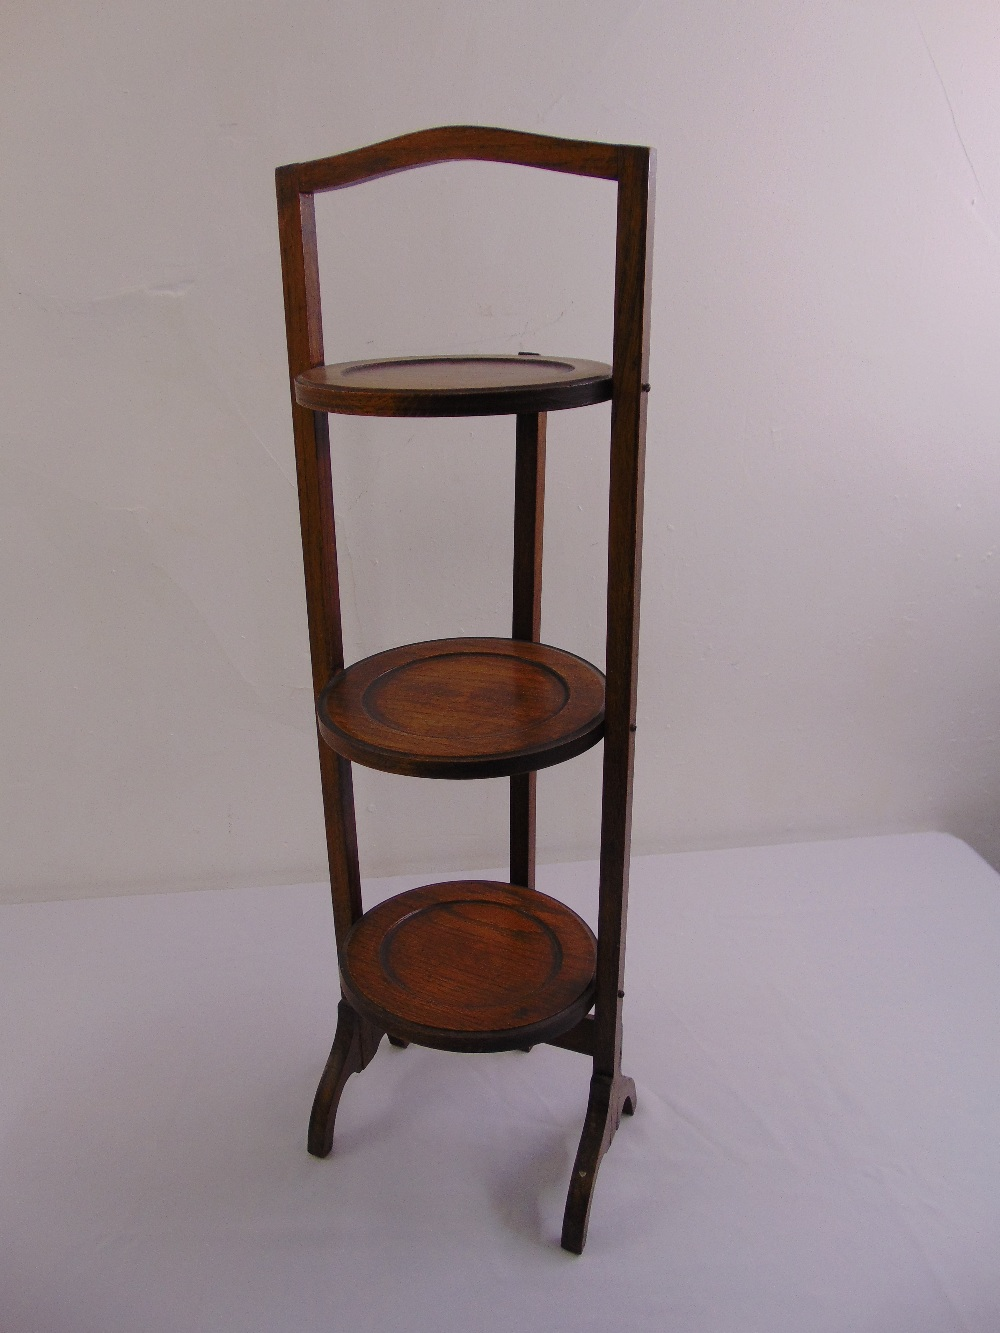 Lot 48 - An oak three tier plate stand